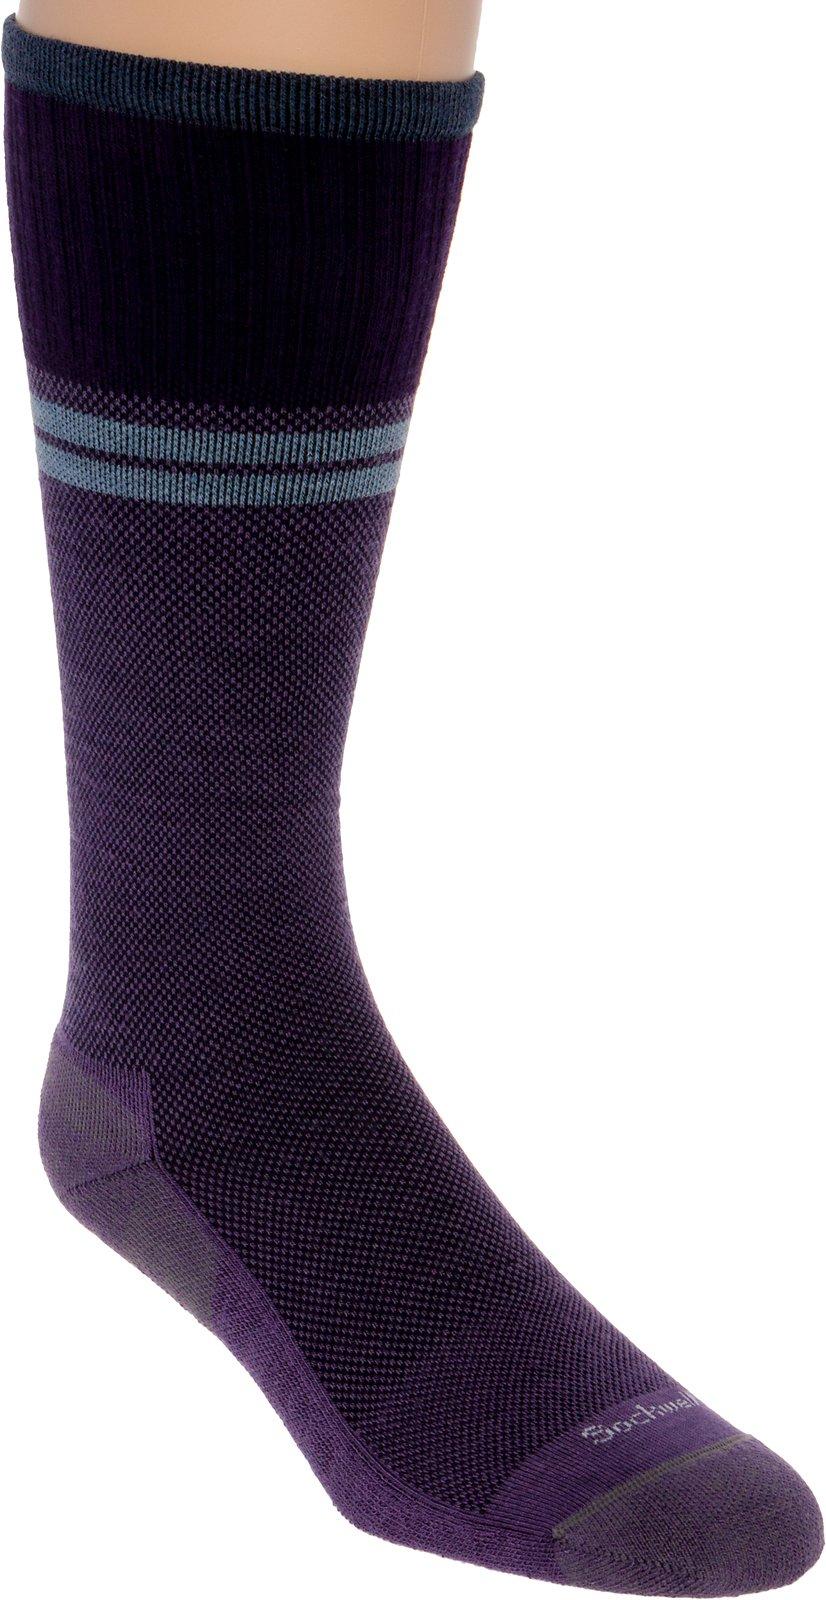 Sockwell Men's Sportster Graduated Compression Socks, Plum, Medium/Large